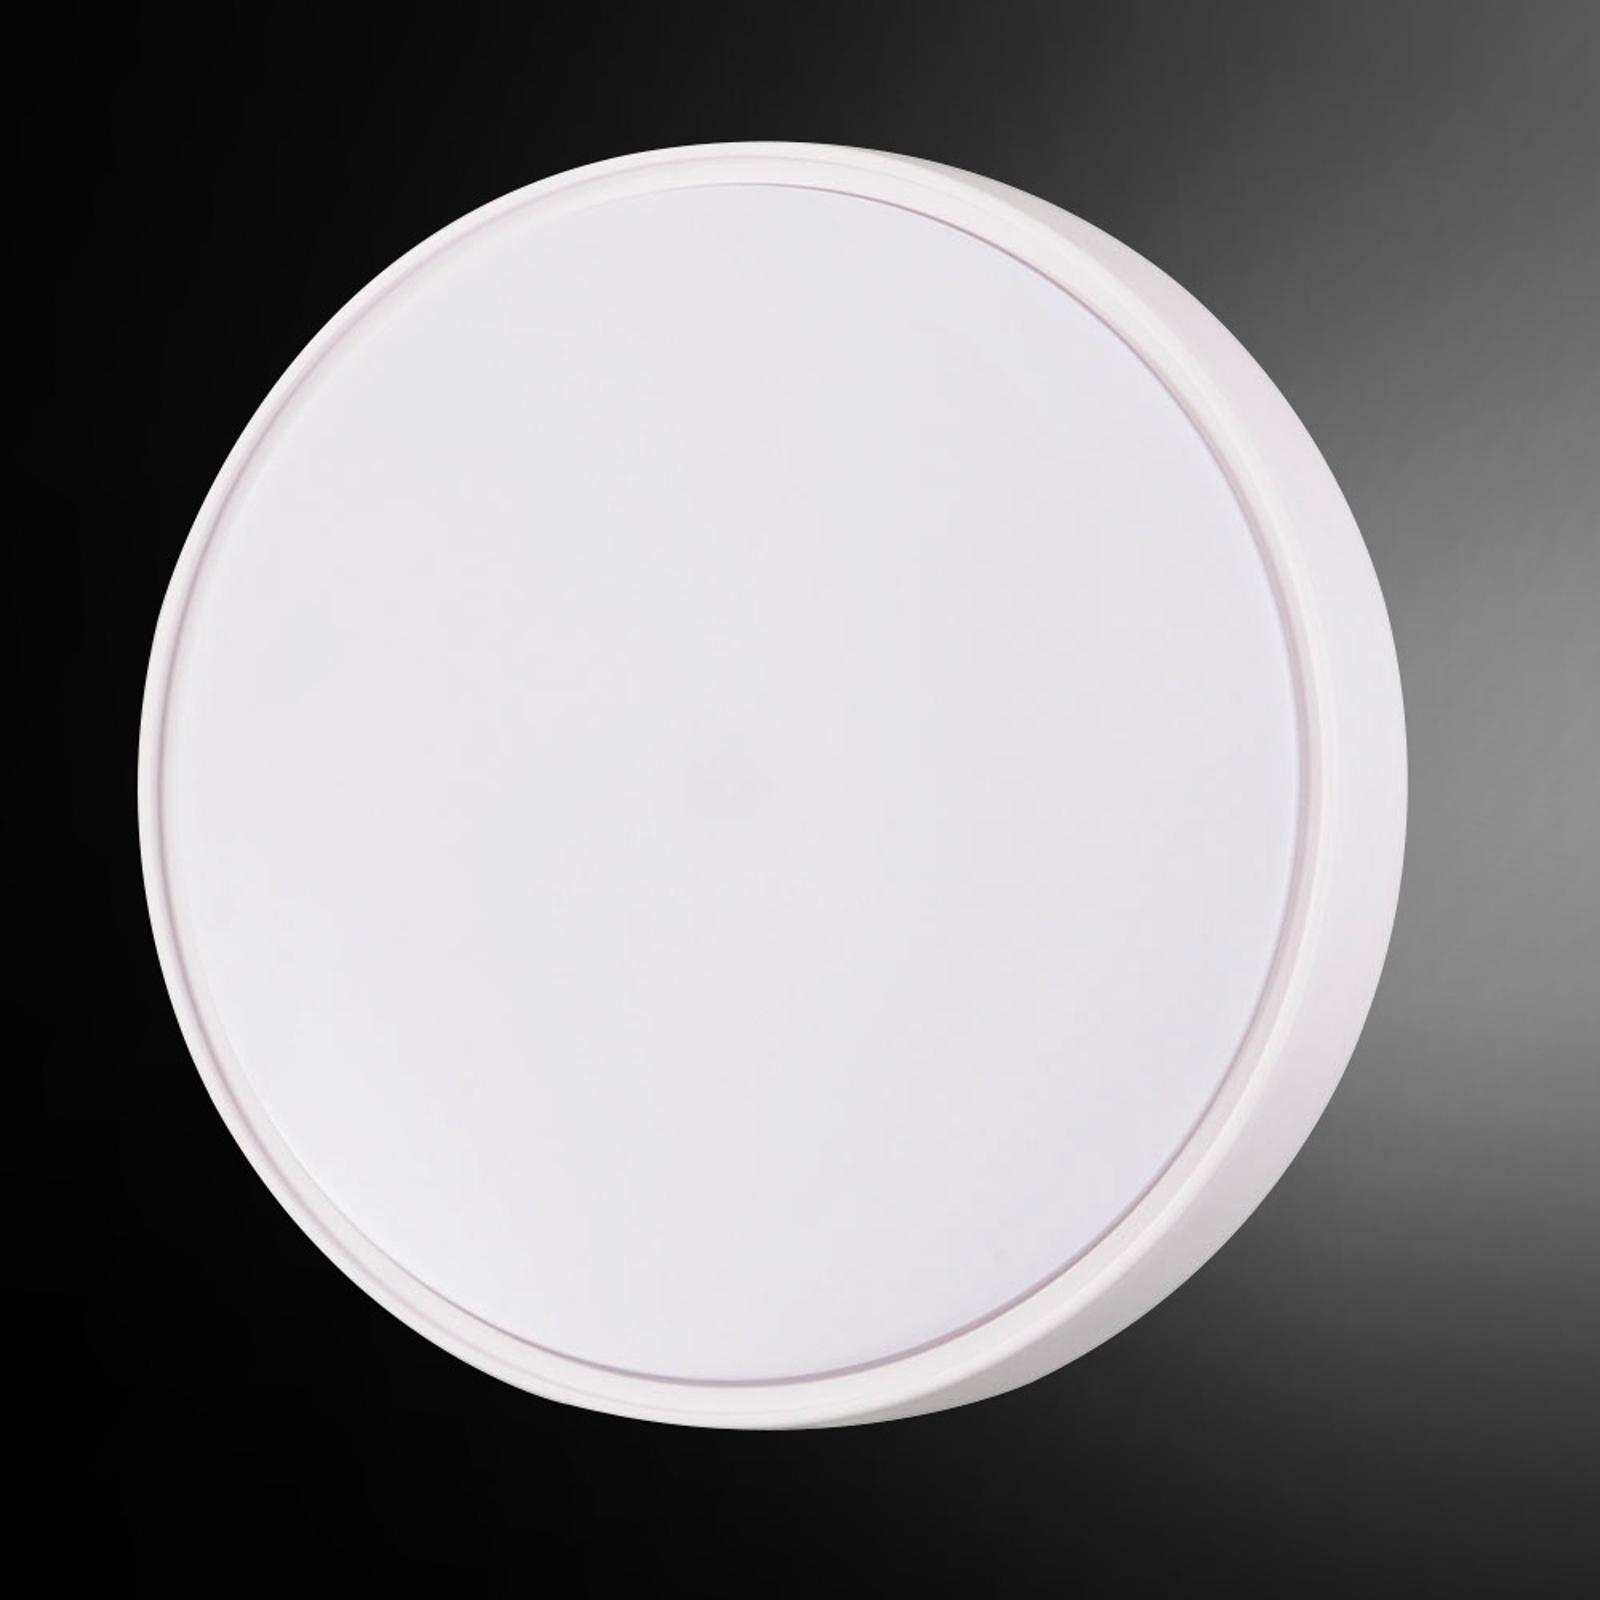 Plafonnier lumineux LED Hatton IP65, 30 cm